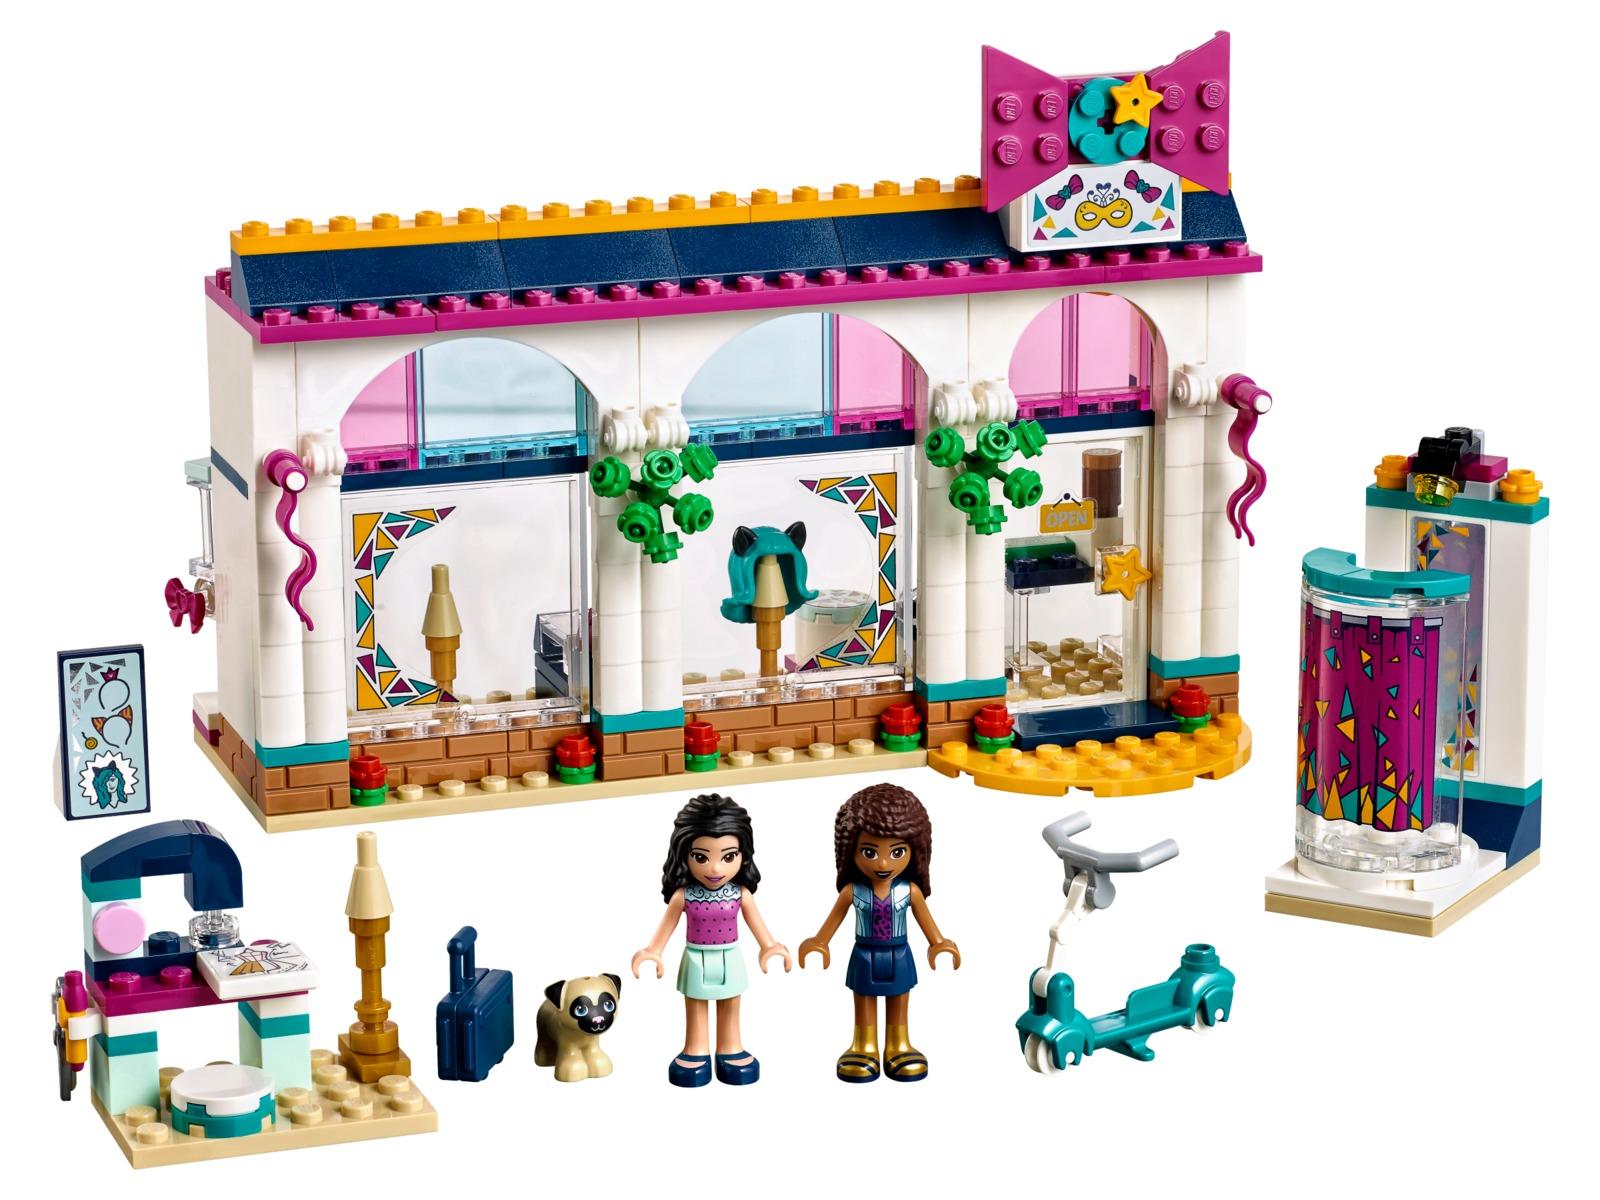 LEGO Friends - Andrea's Accessories Store (41344) image